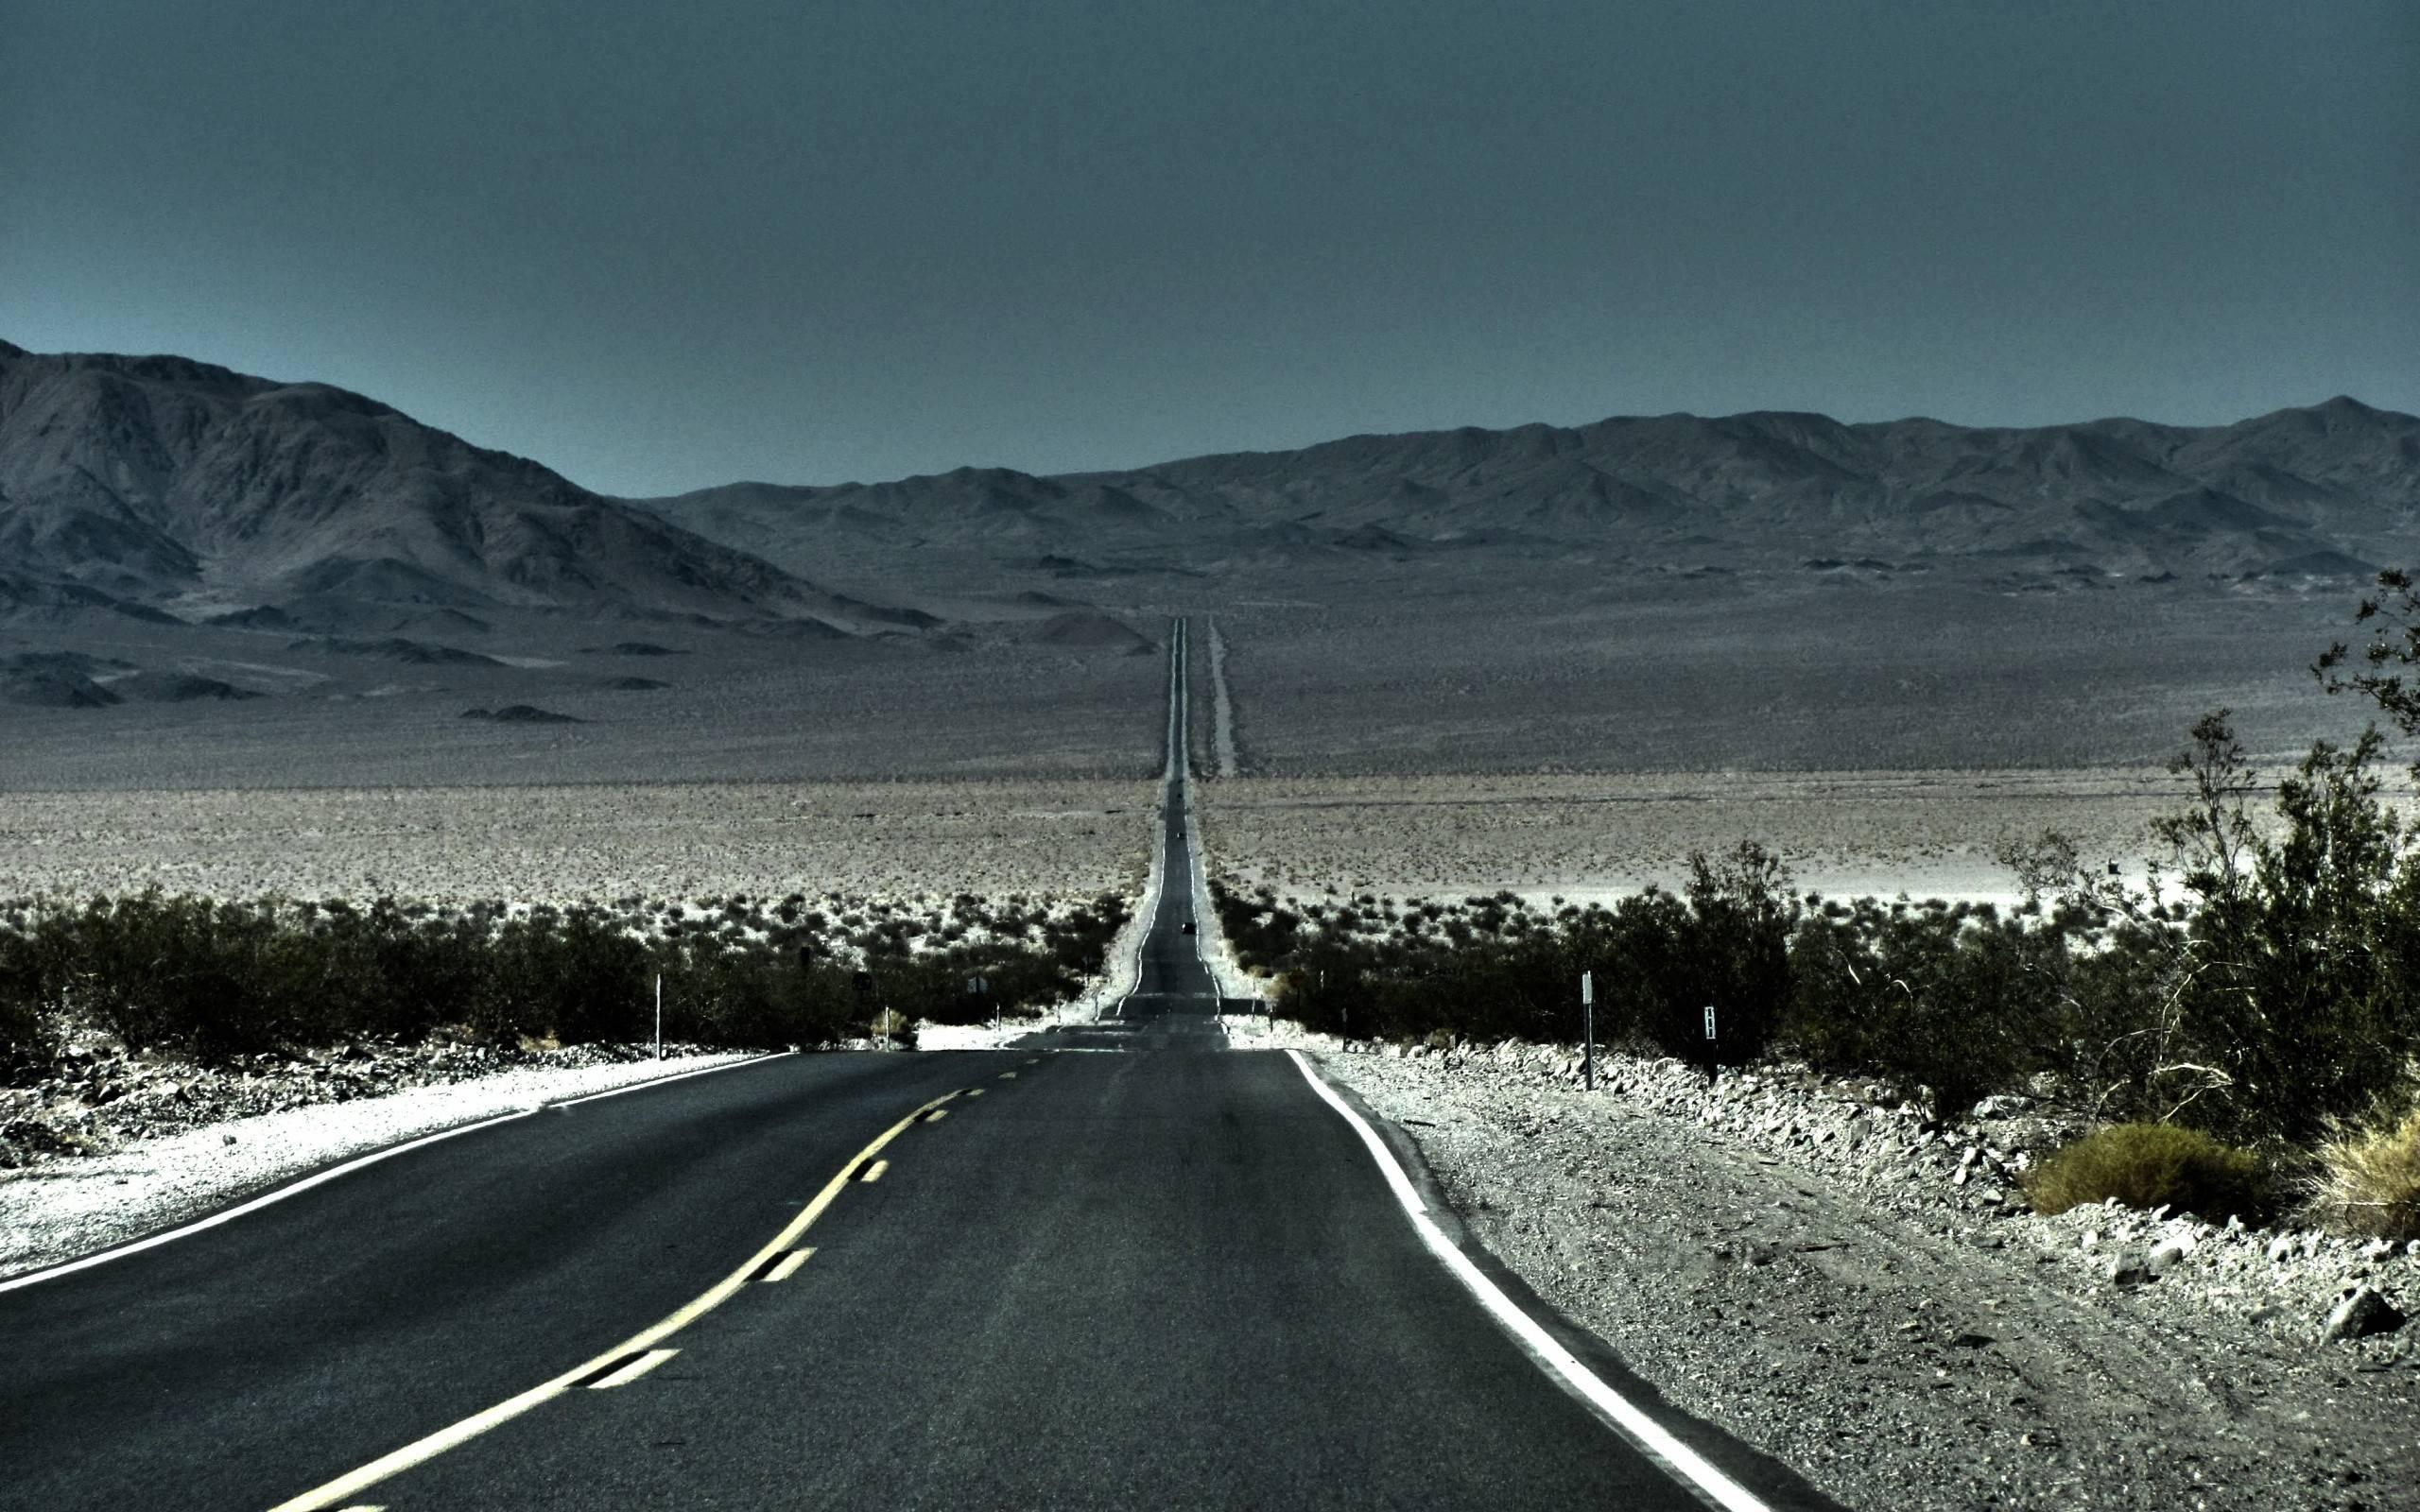 route 66 wallpaper hd - photo #11